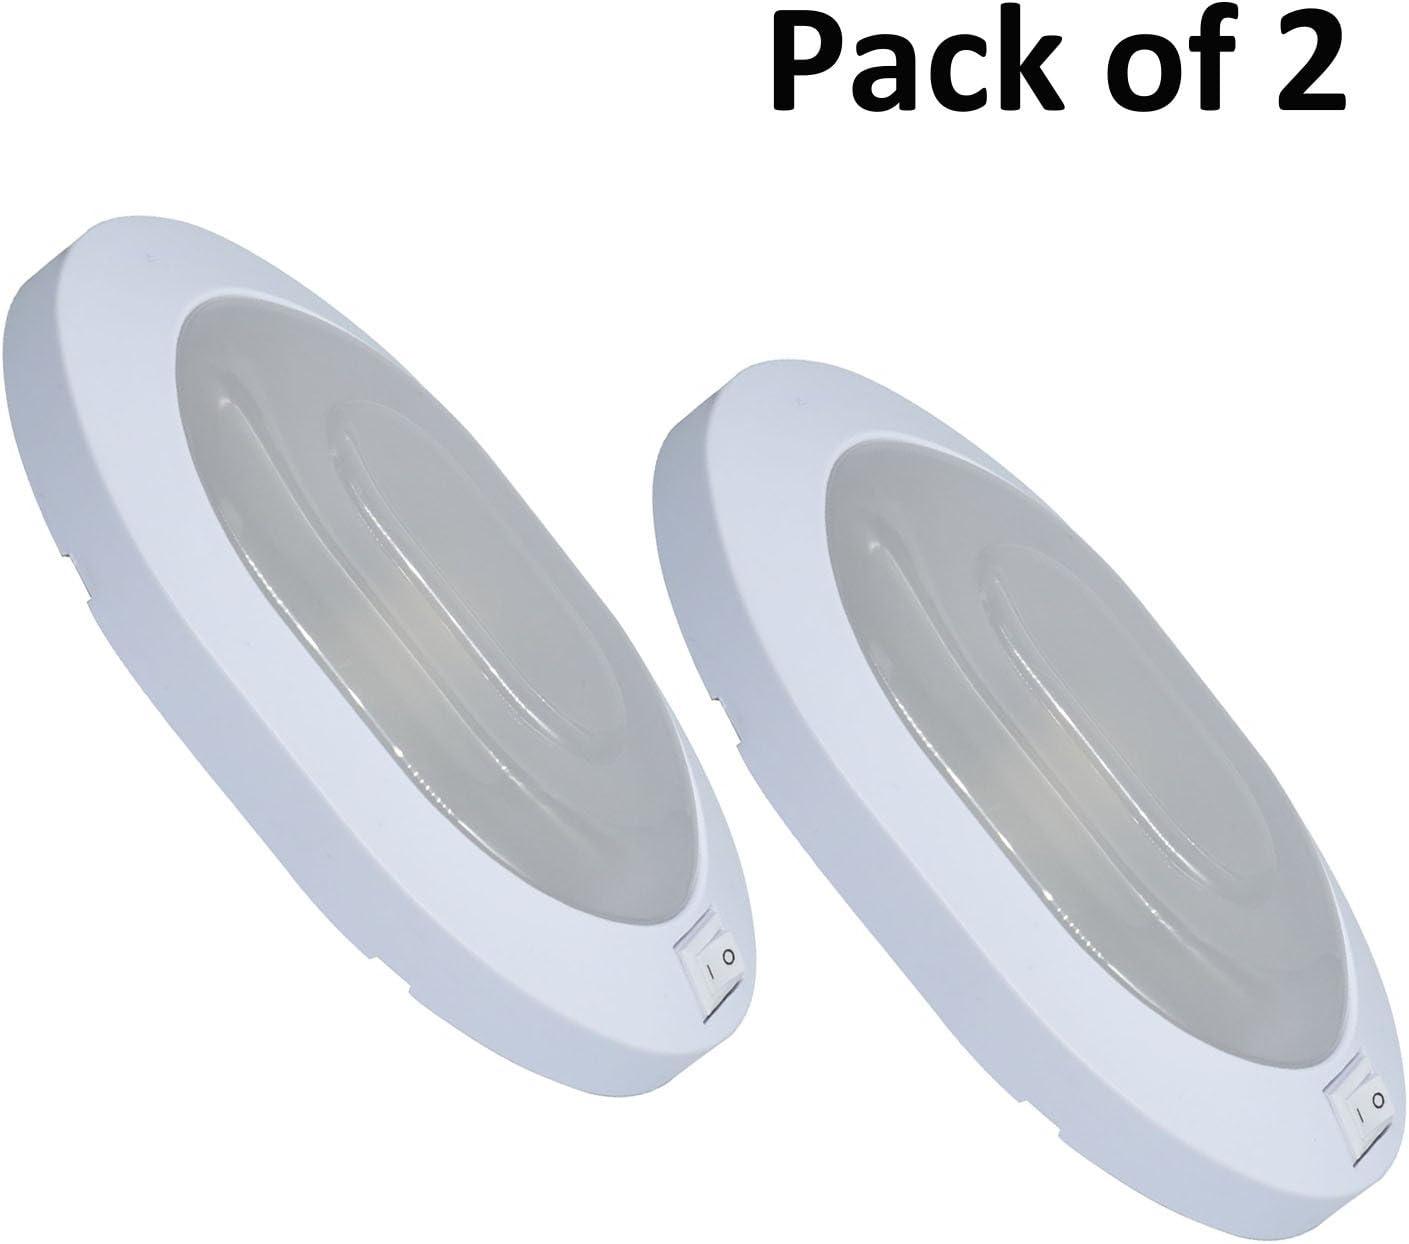 Facon 2pcs LED Luces de Techo, luz Interior con Interruptor de Encendido/Apagado 12V 4W Luces ovales para Autocaravana, Autocaravana (Blanco)